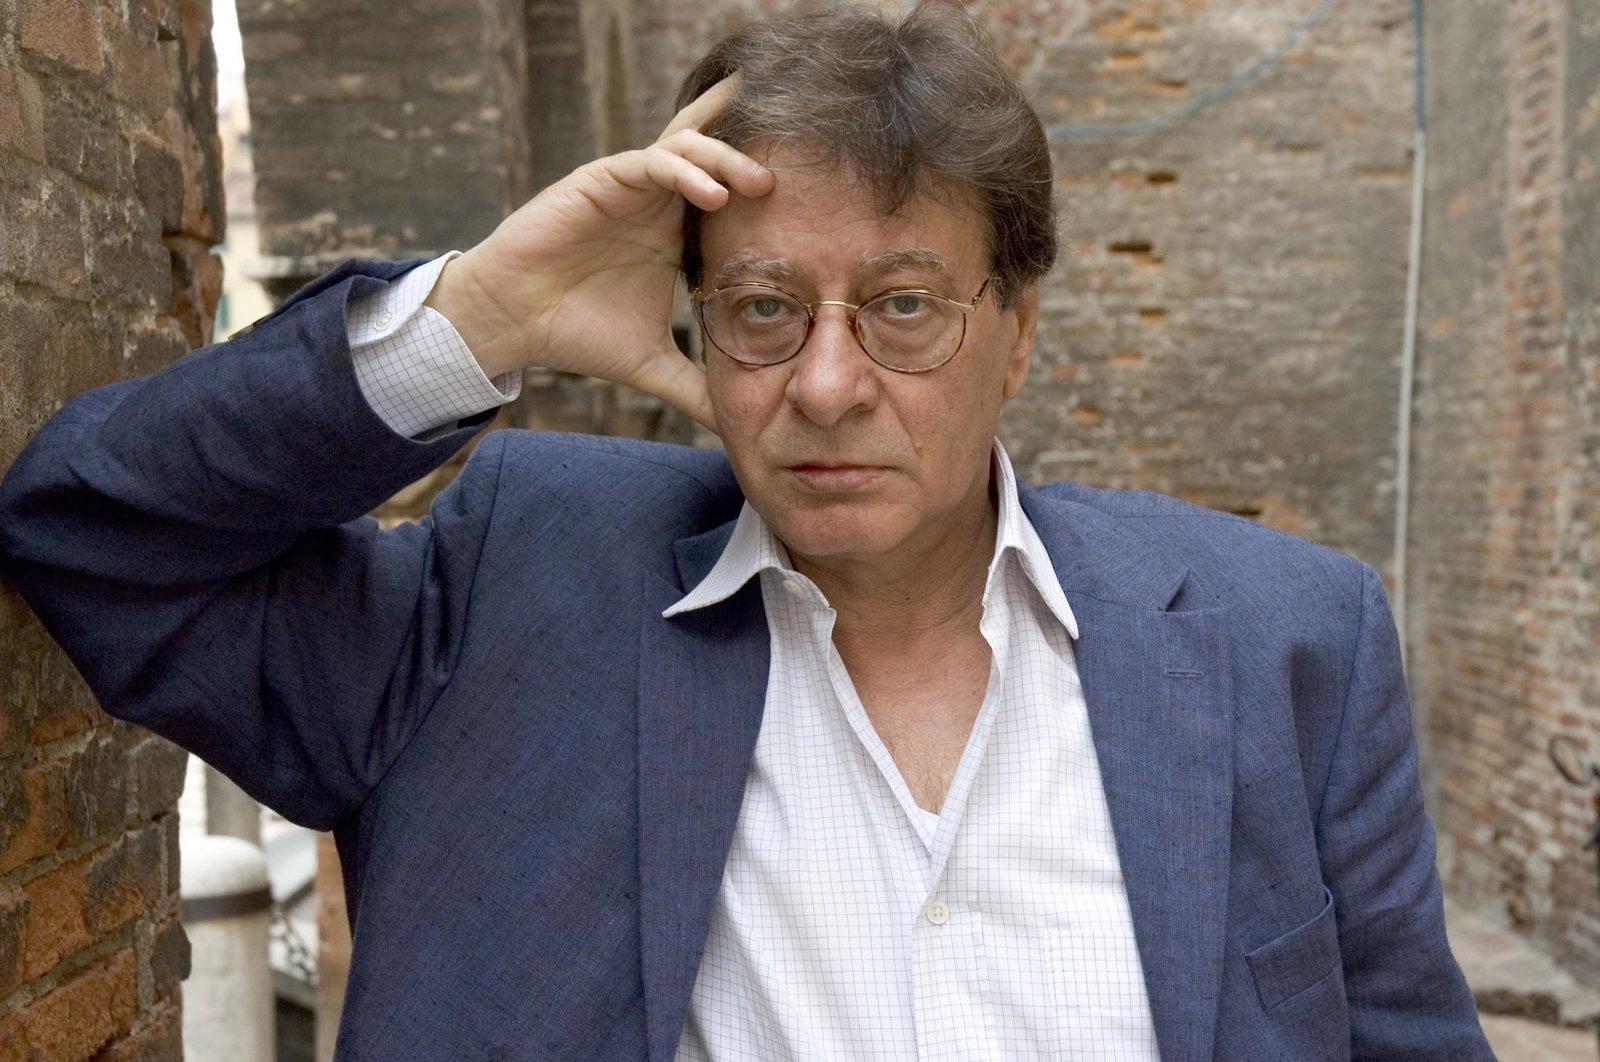 Mahmoud Darwish, Palestinian, poet, writer, novelist, portrait, Turin, Italy, 2005. (Getty Images)